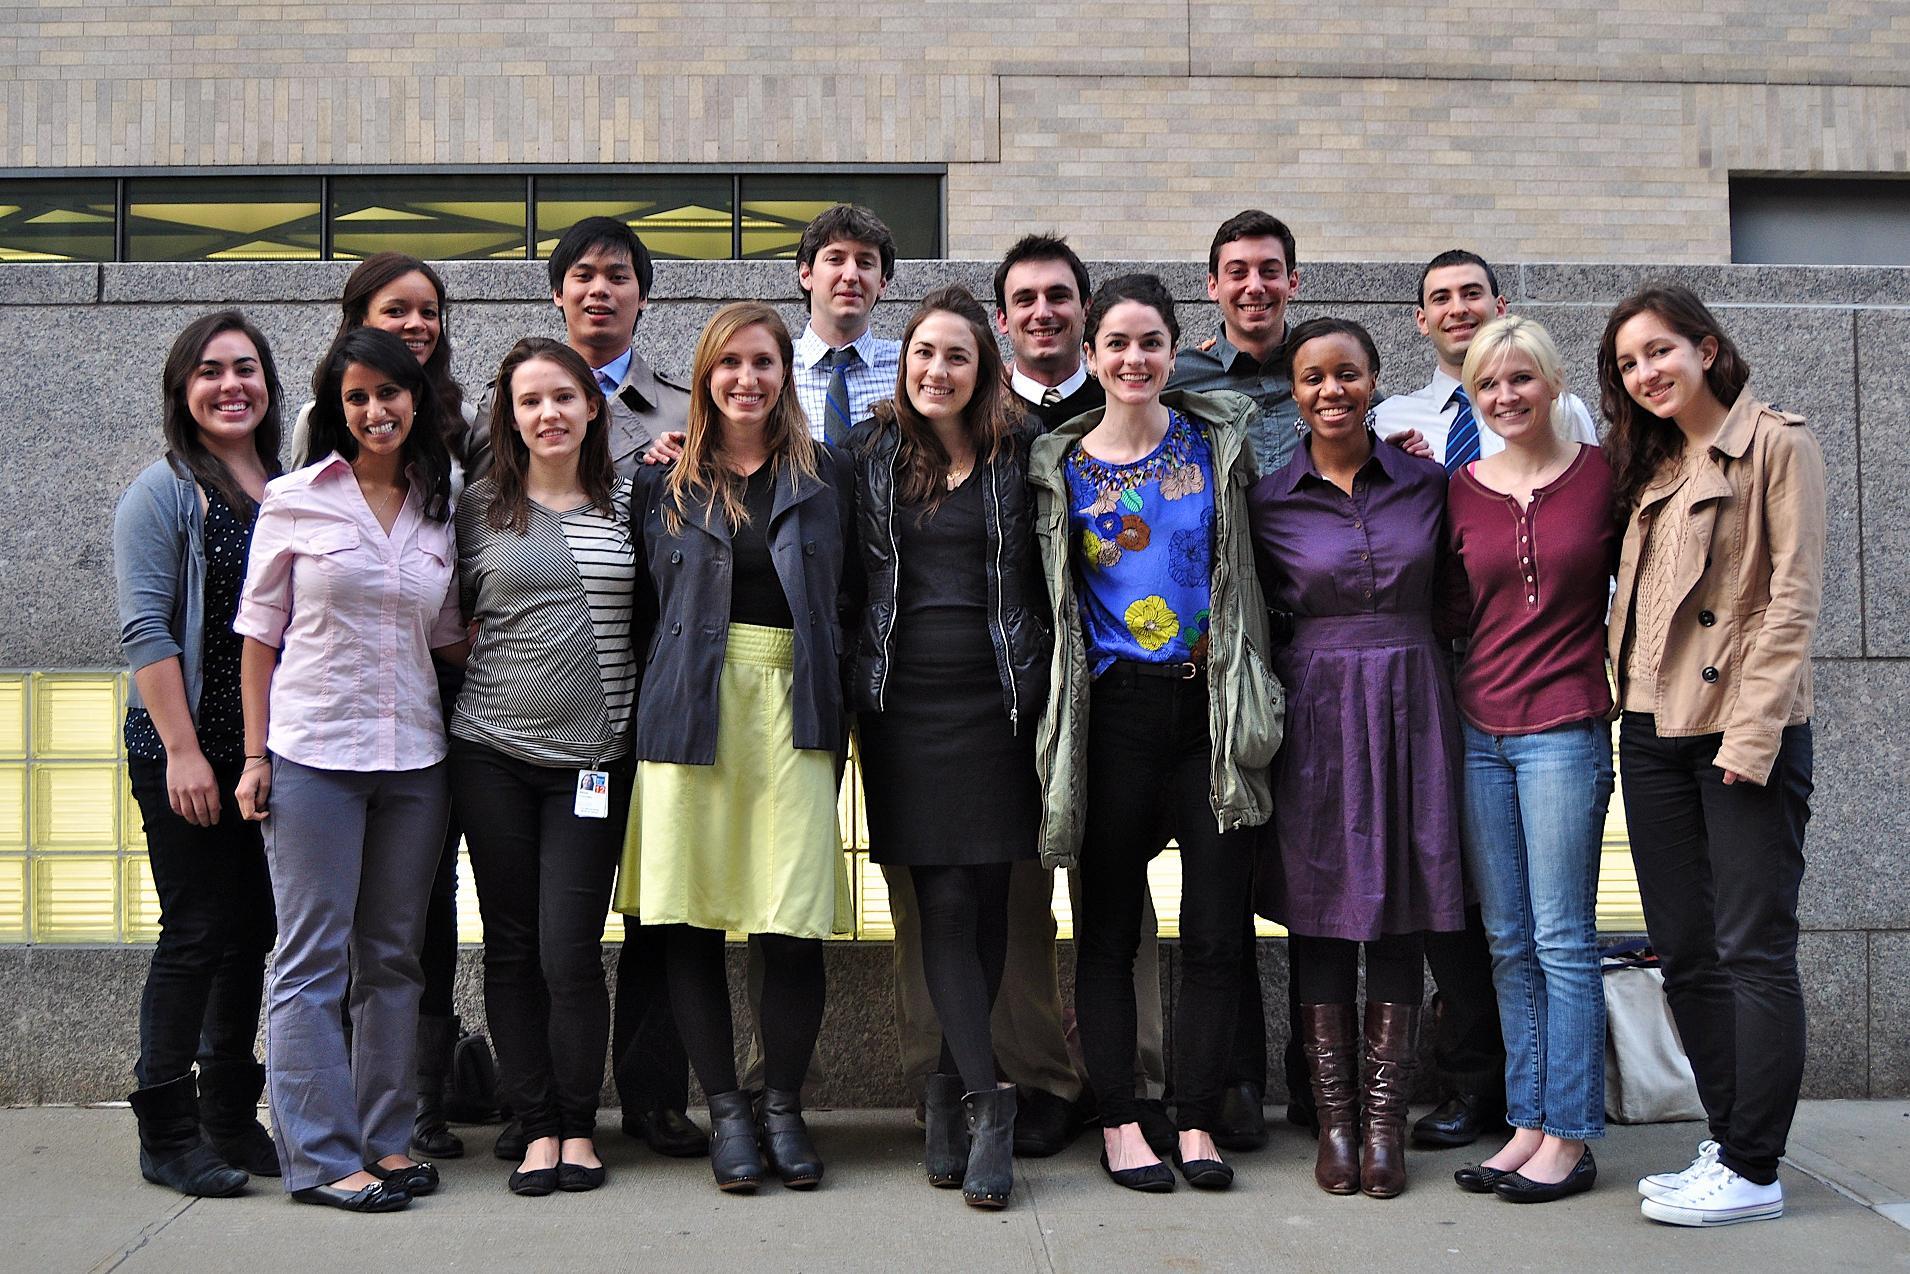 http://blog.mountsinai.org/blog/a-student-run-program-for-social-justice/